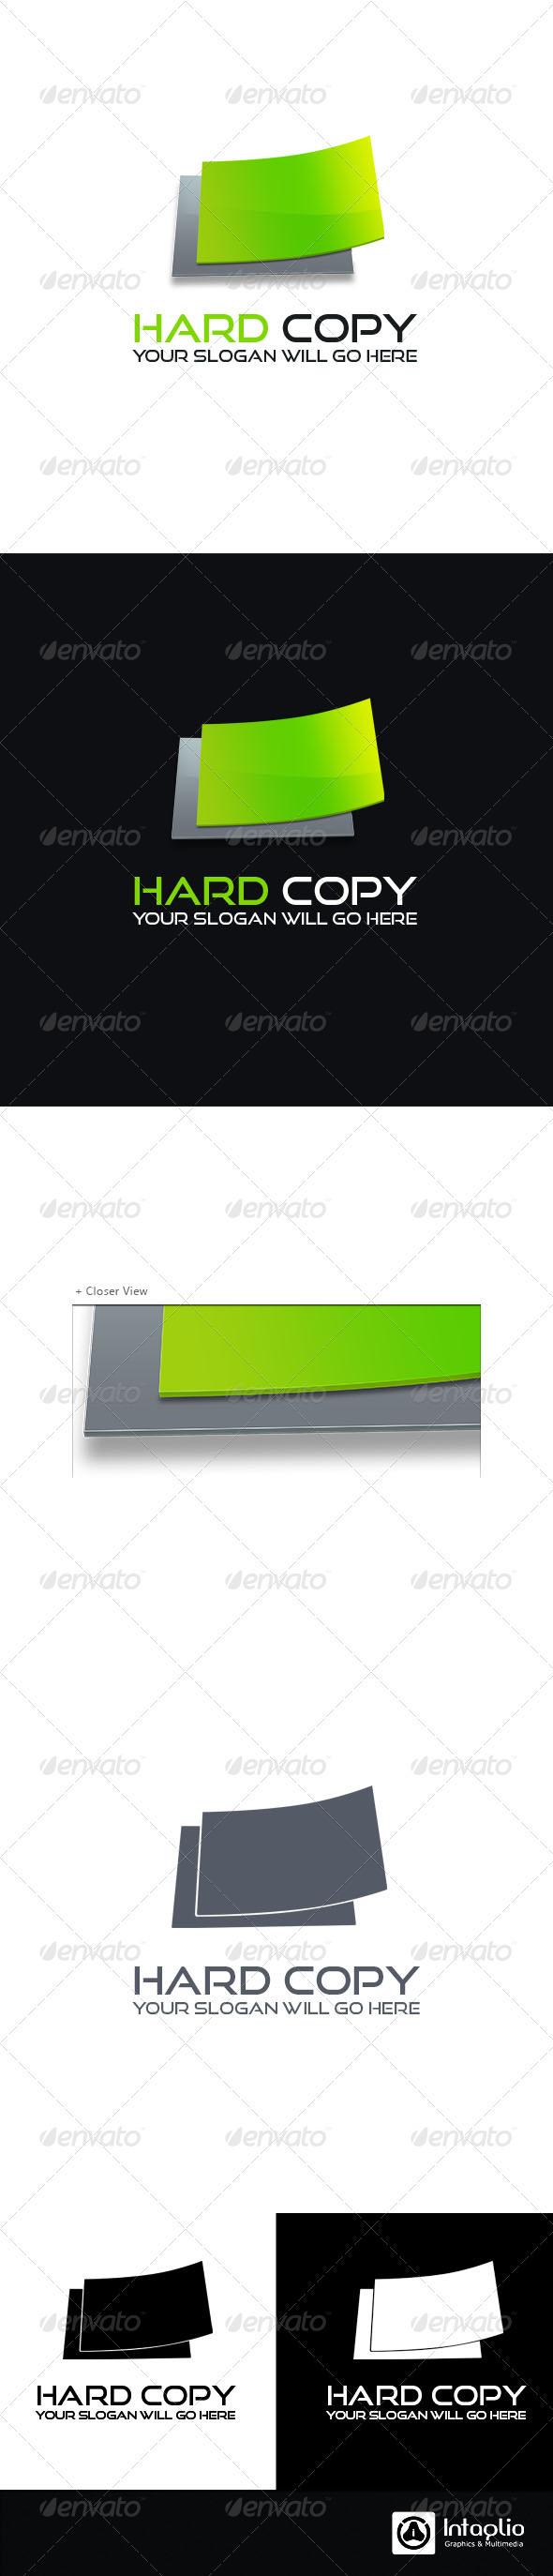 Print Logo - Hard Copy